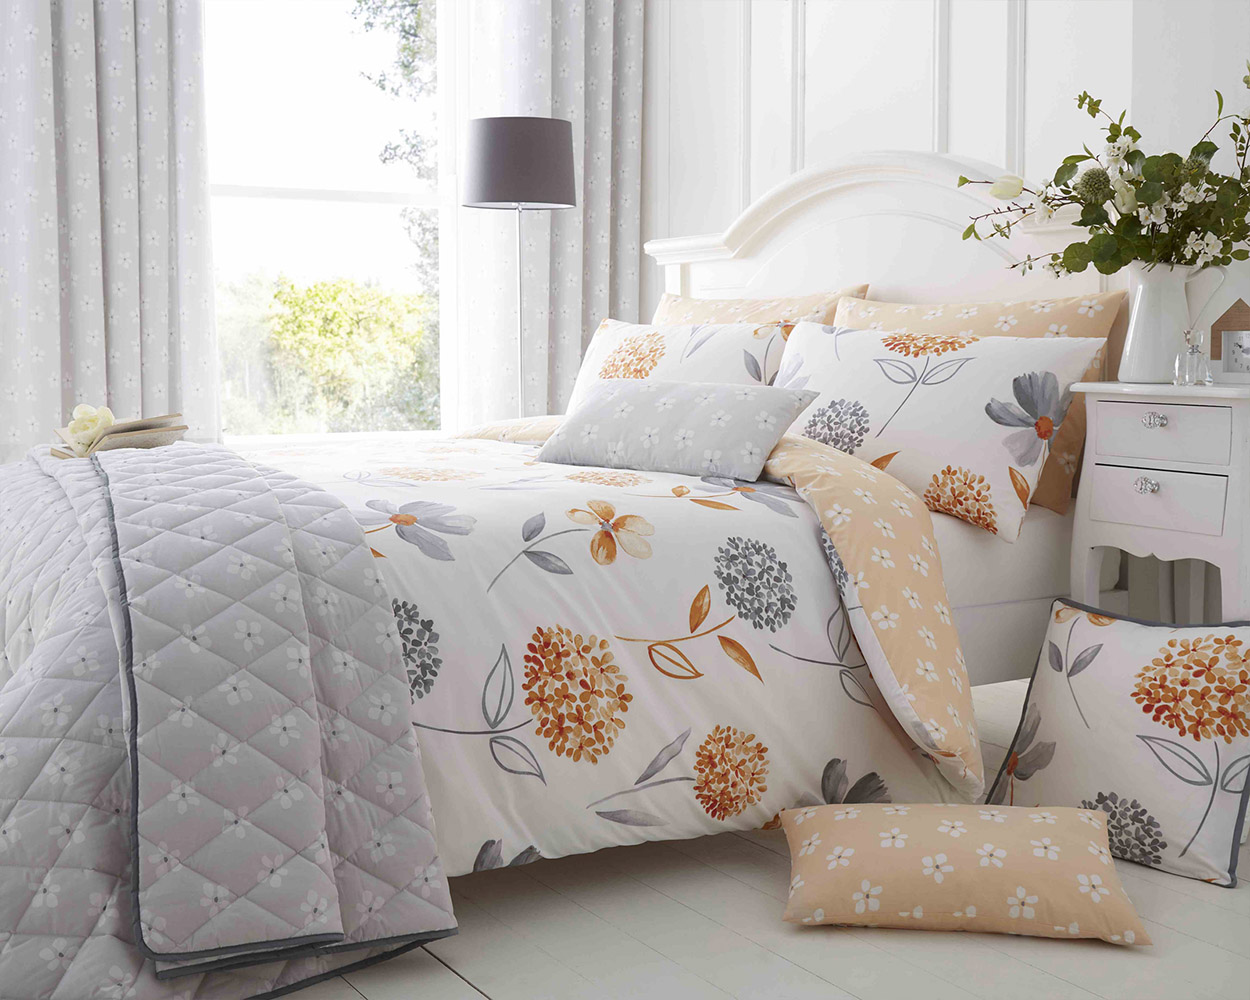 Cotton Rich Caroline Floral Design Duvet Set In Sunset Orange And Light Grey Thumbnail 1